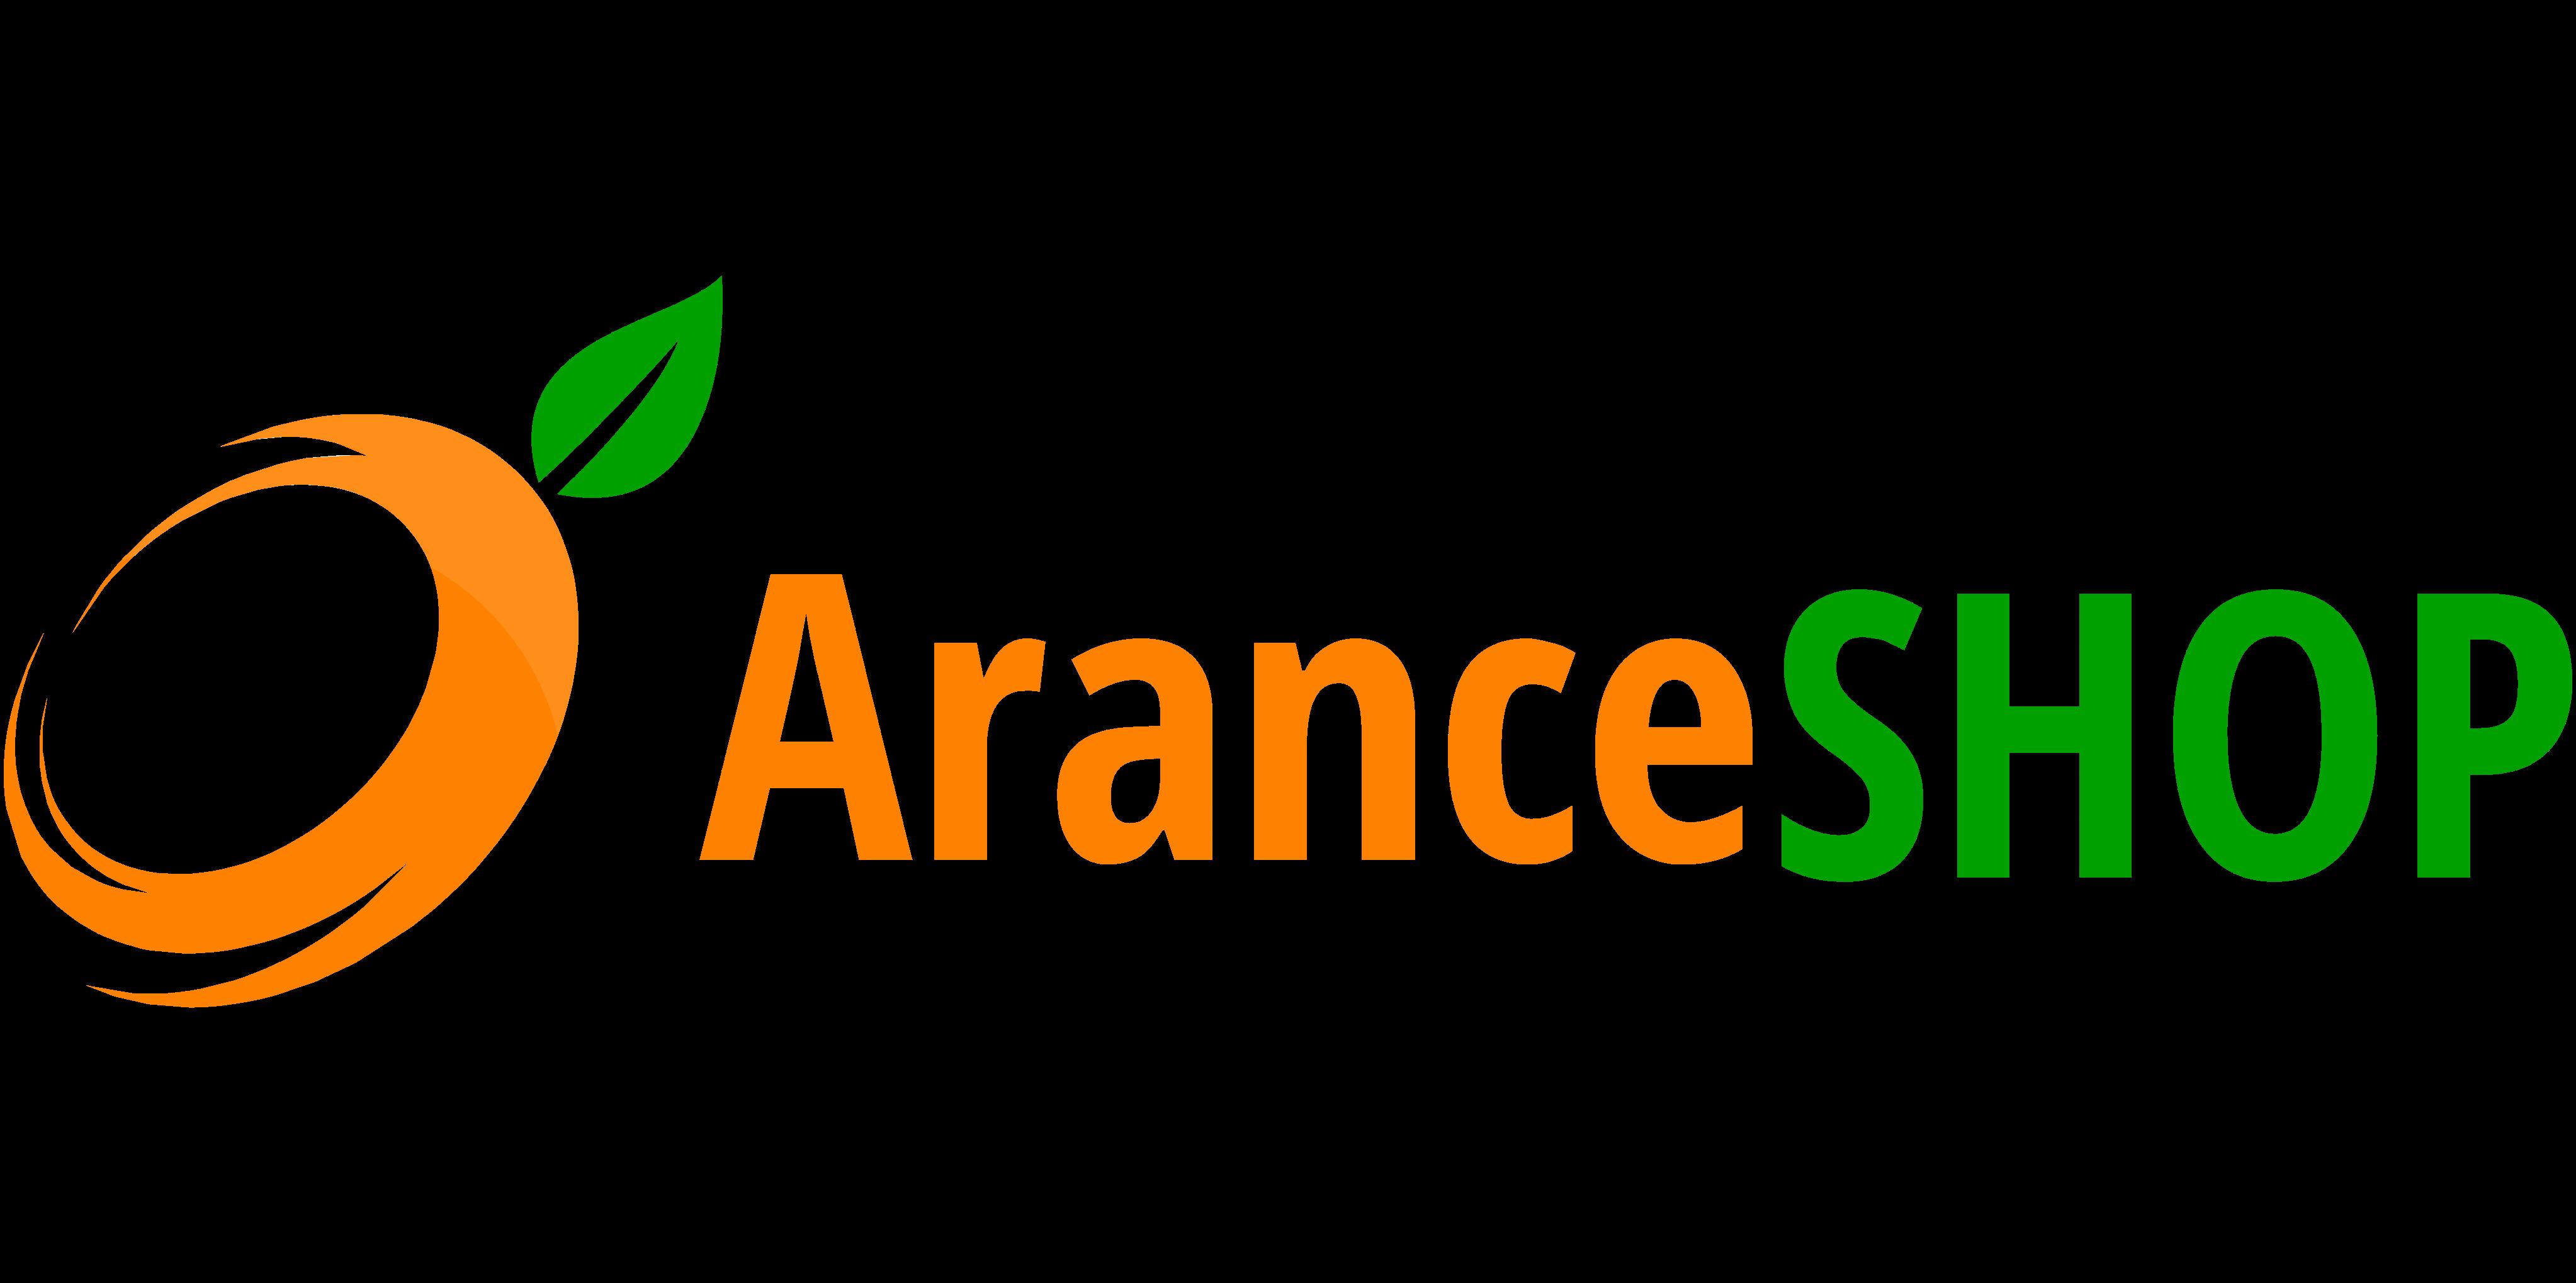 Vendita  Arance a Polpa Rossa di Sicilia | AranceSHOP